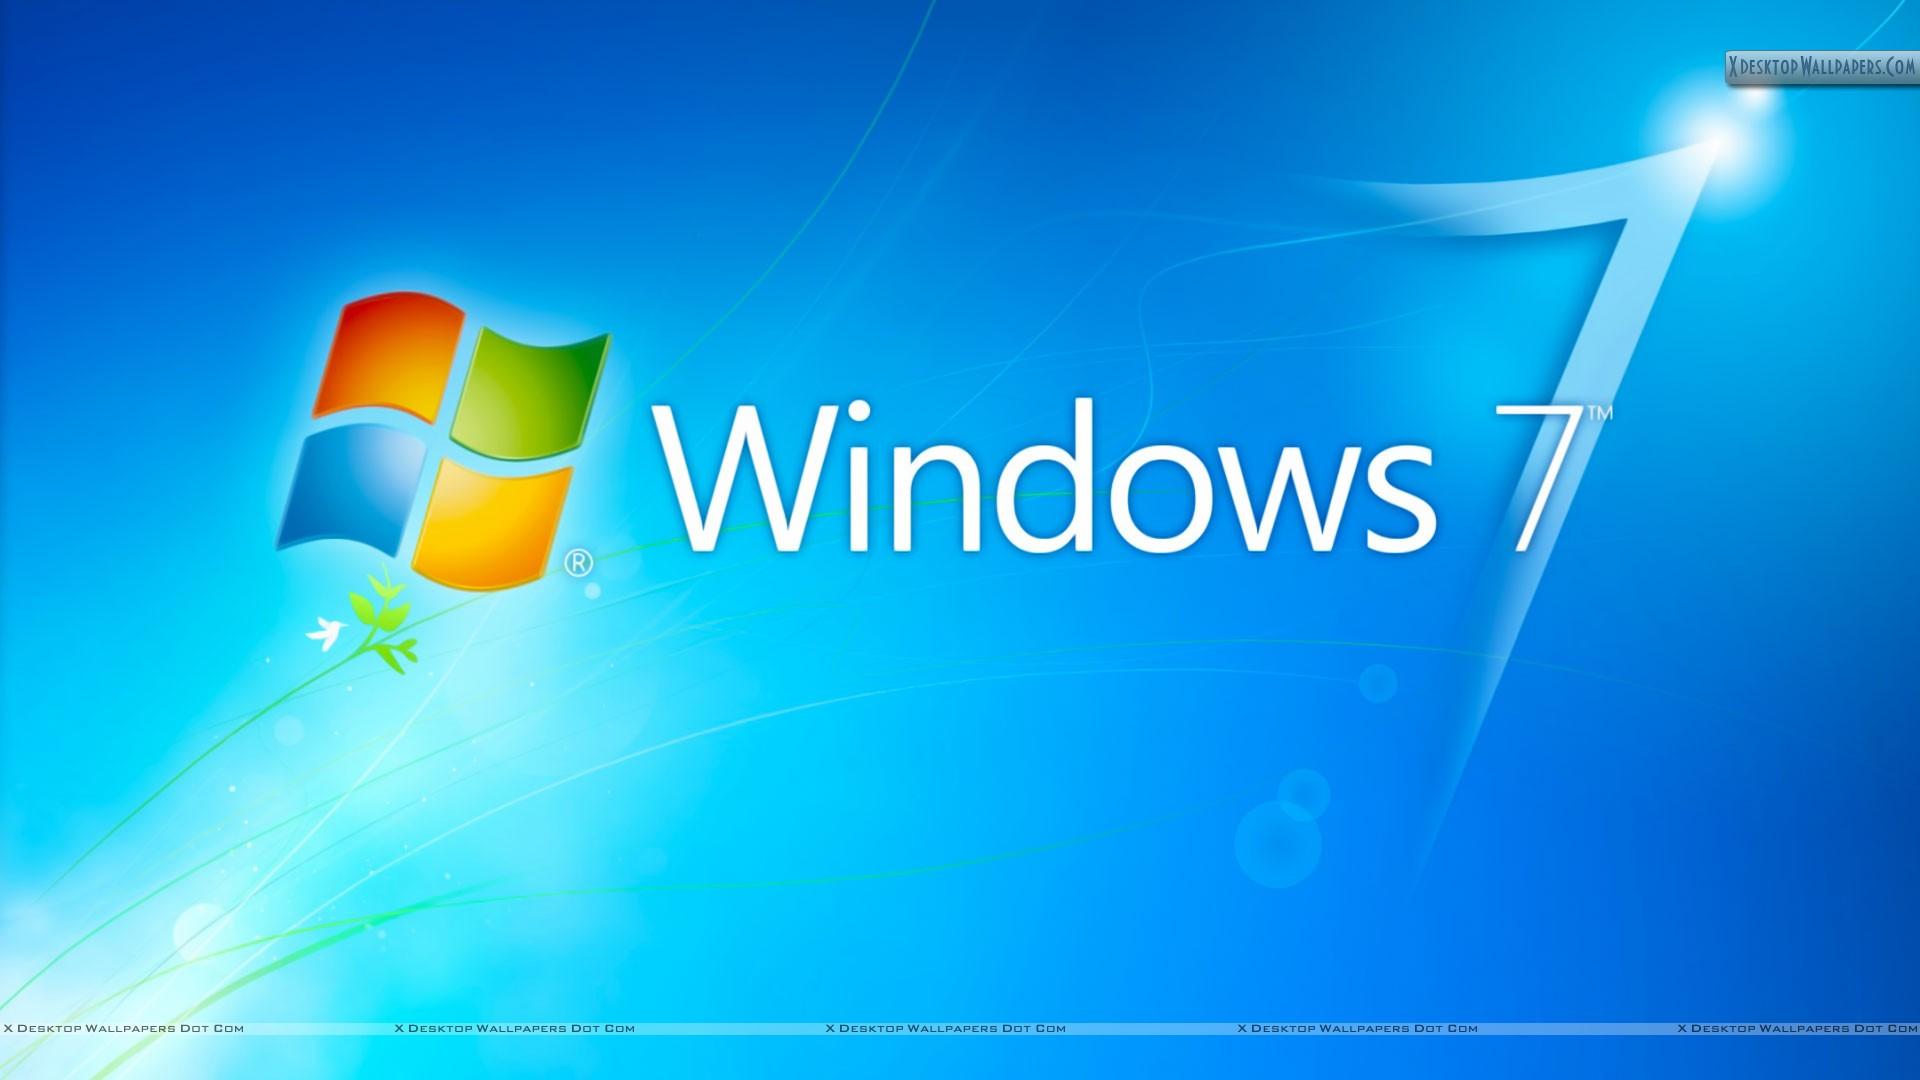 HD Windows Wallpaper Desktop Background wallpaper download 1920x1080